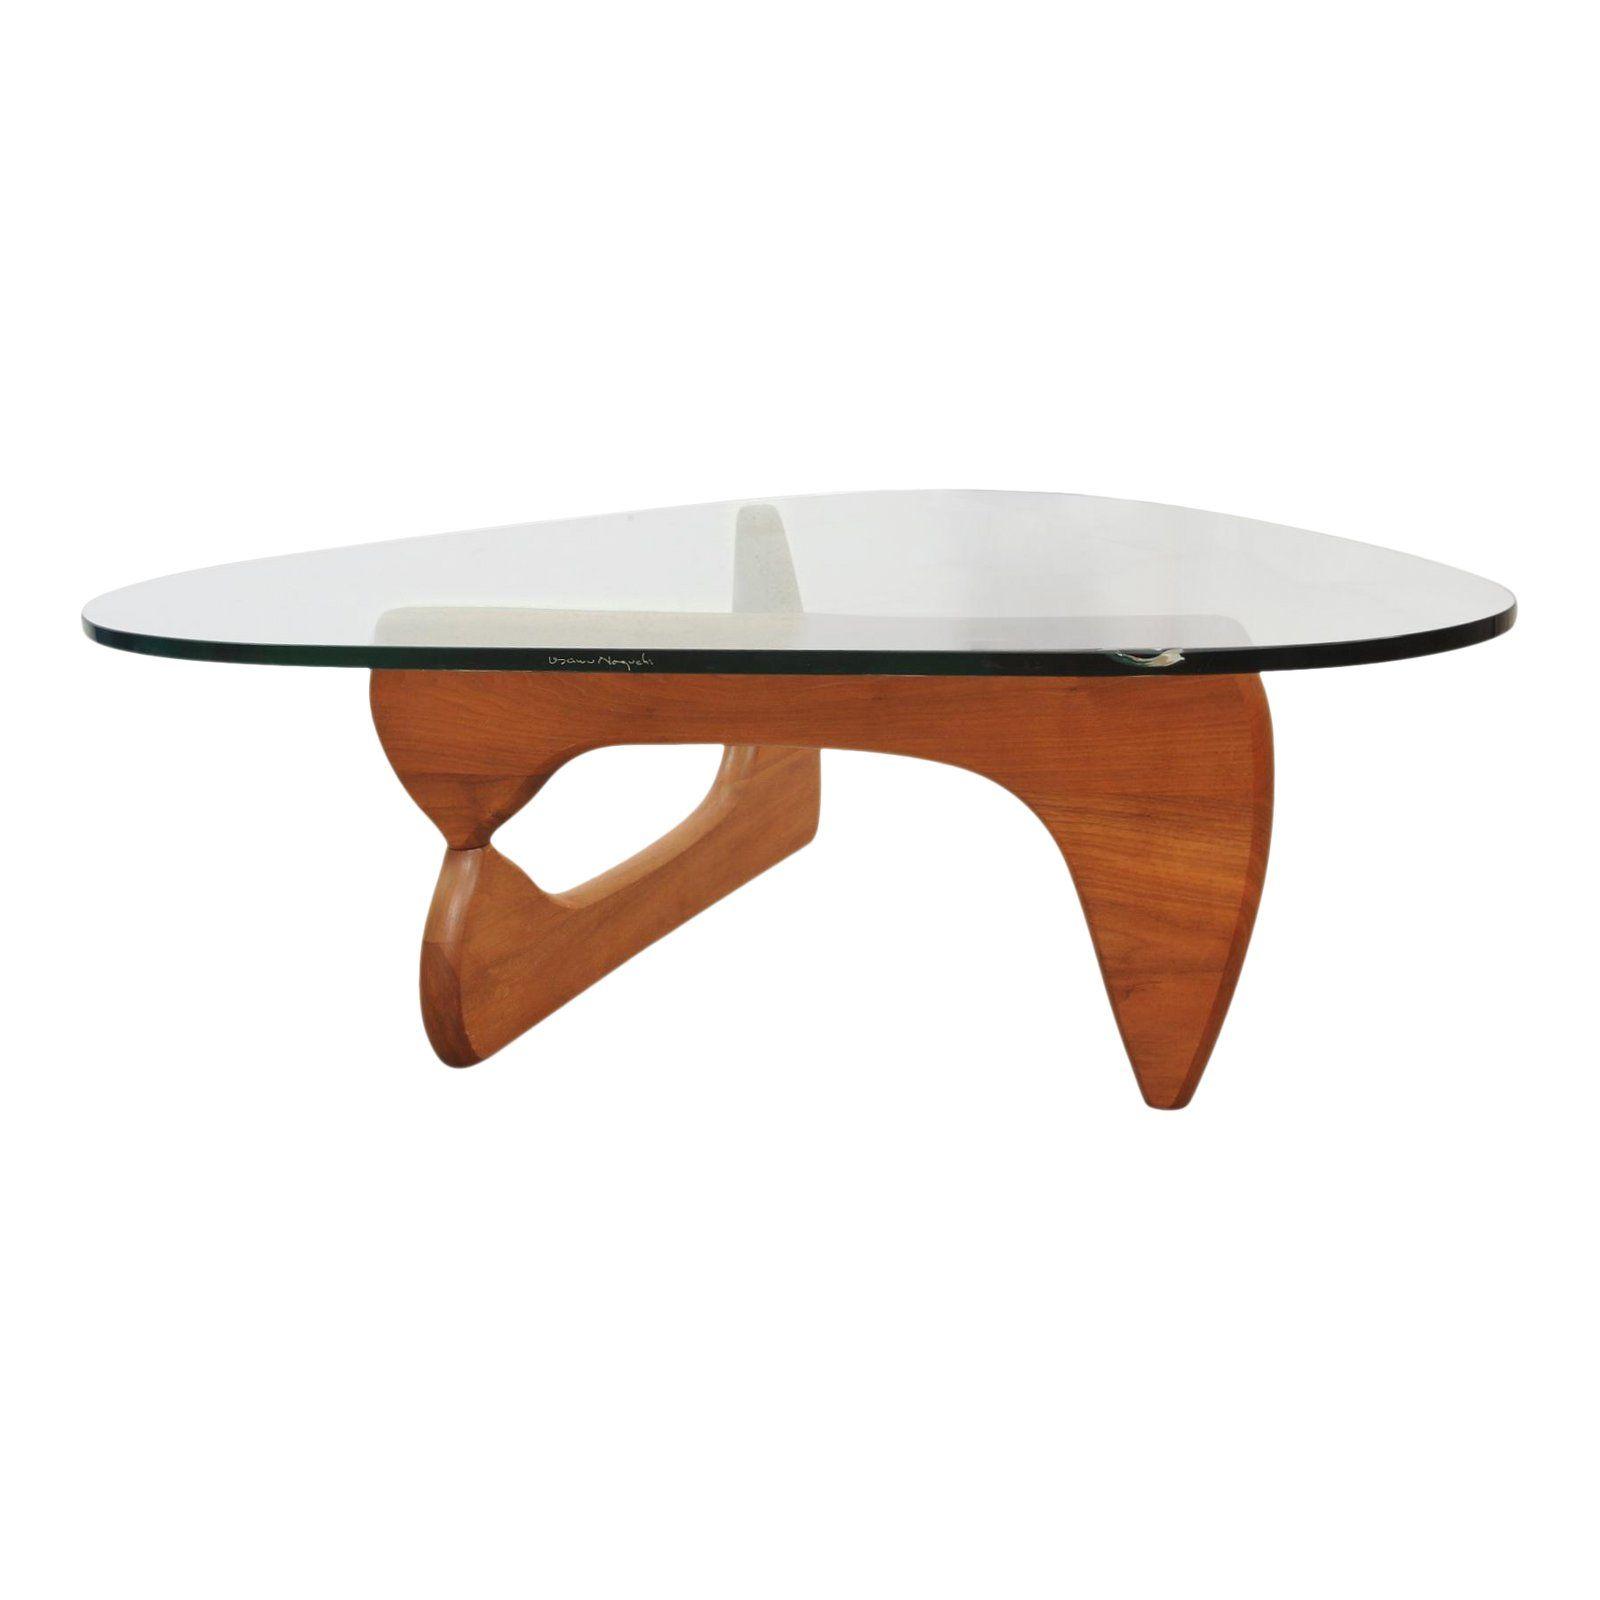 1960 S Mid Century Modern Isamu Noguchi Designed For Herman Miller Coffee Table Chairish Herman Miller Coffee Table Coffee Table Noguchi Coffee Table [ 1600 x 1600 Pixel ]